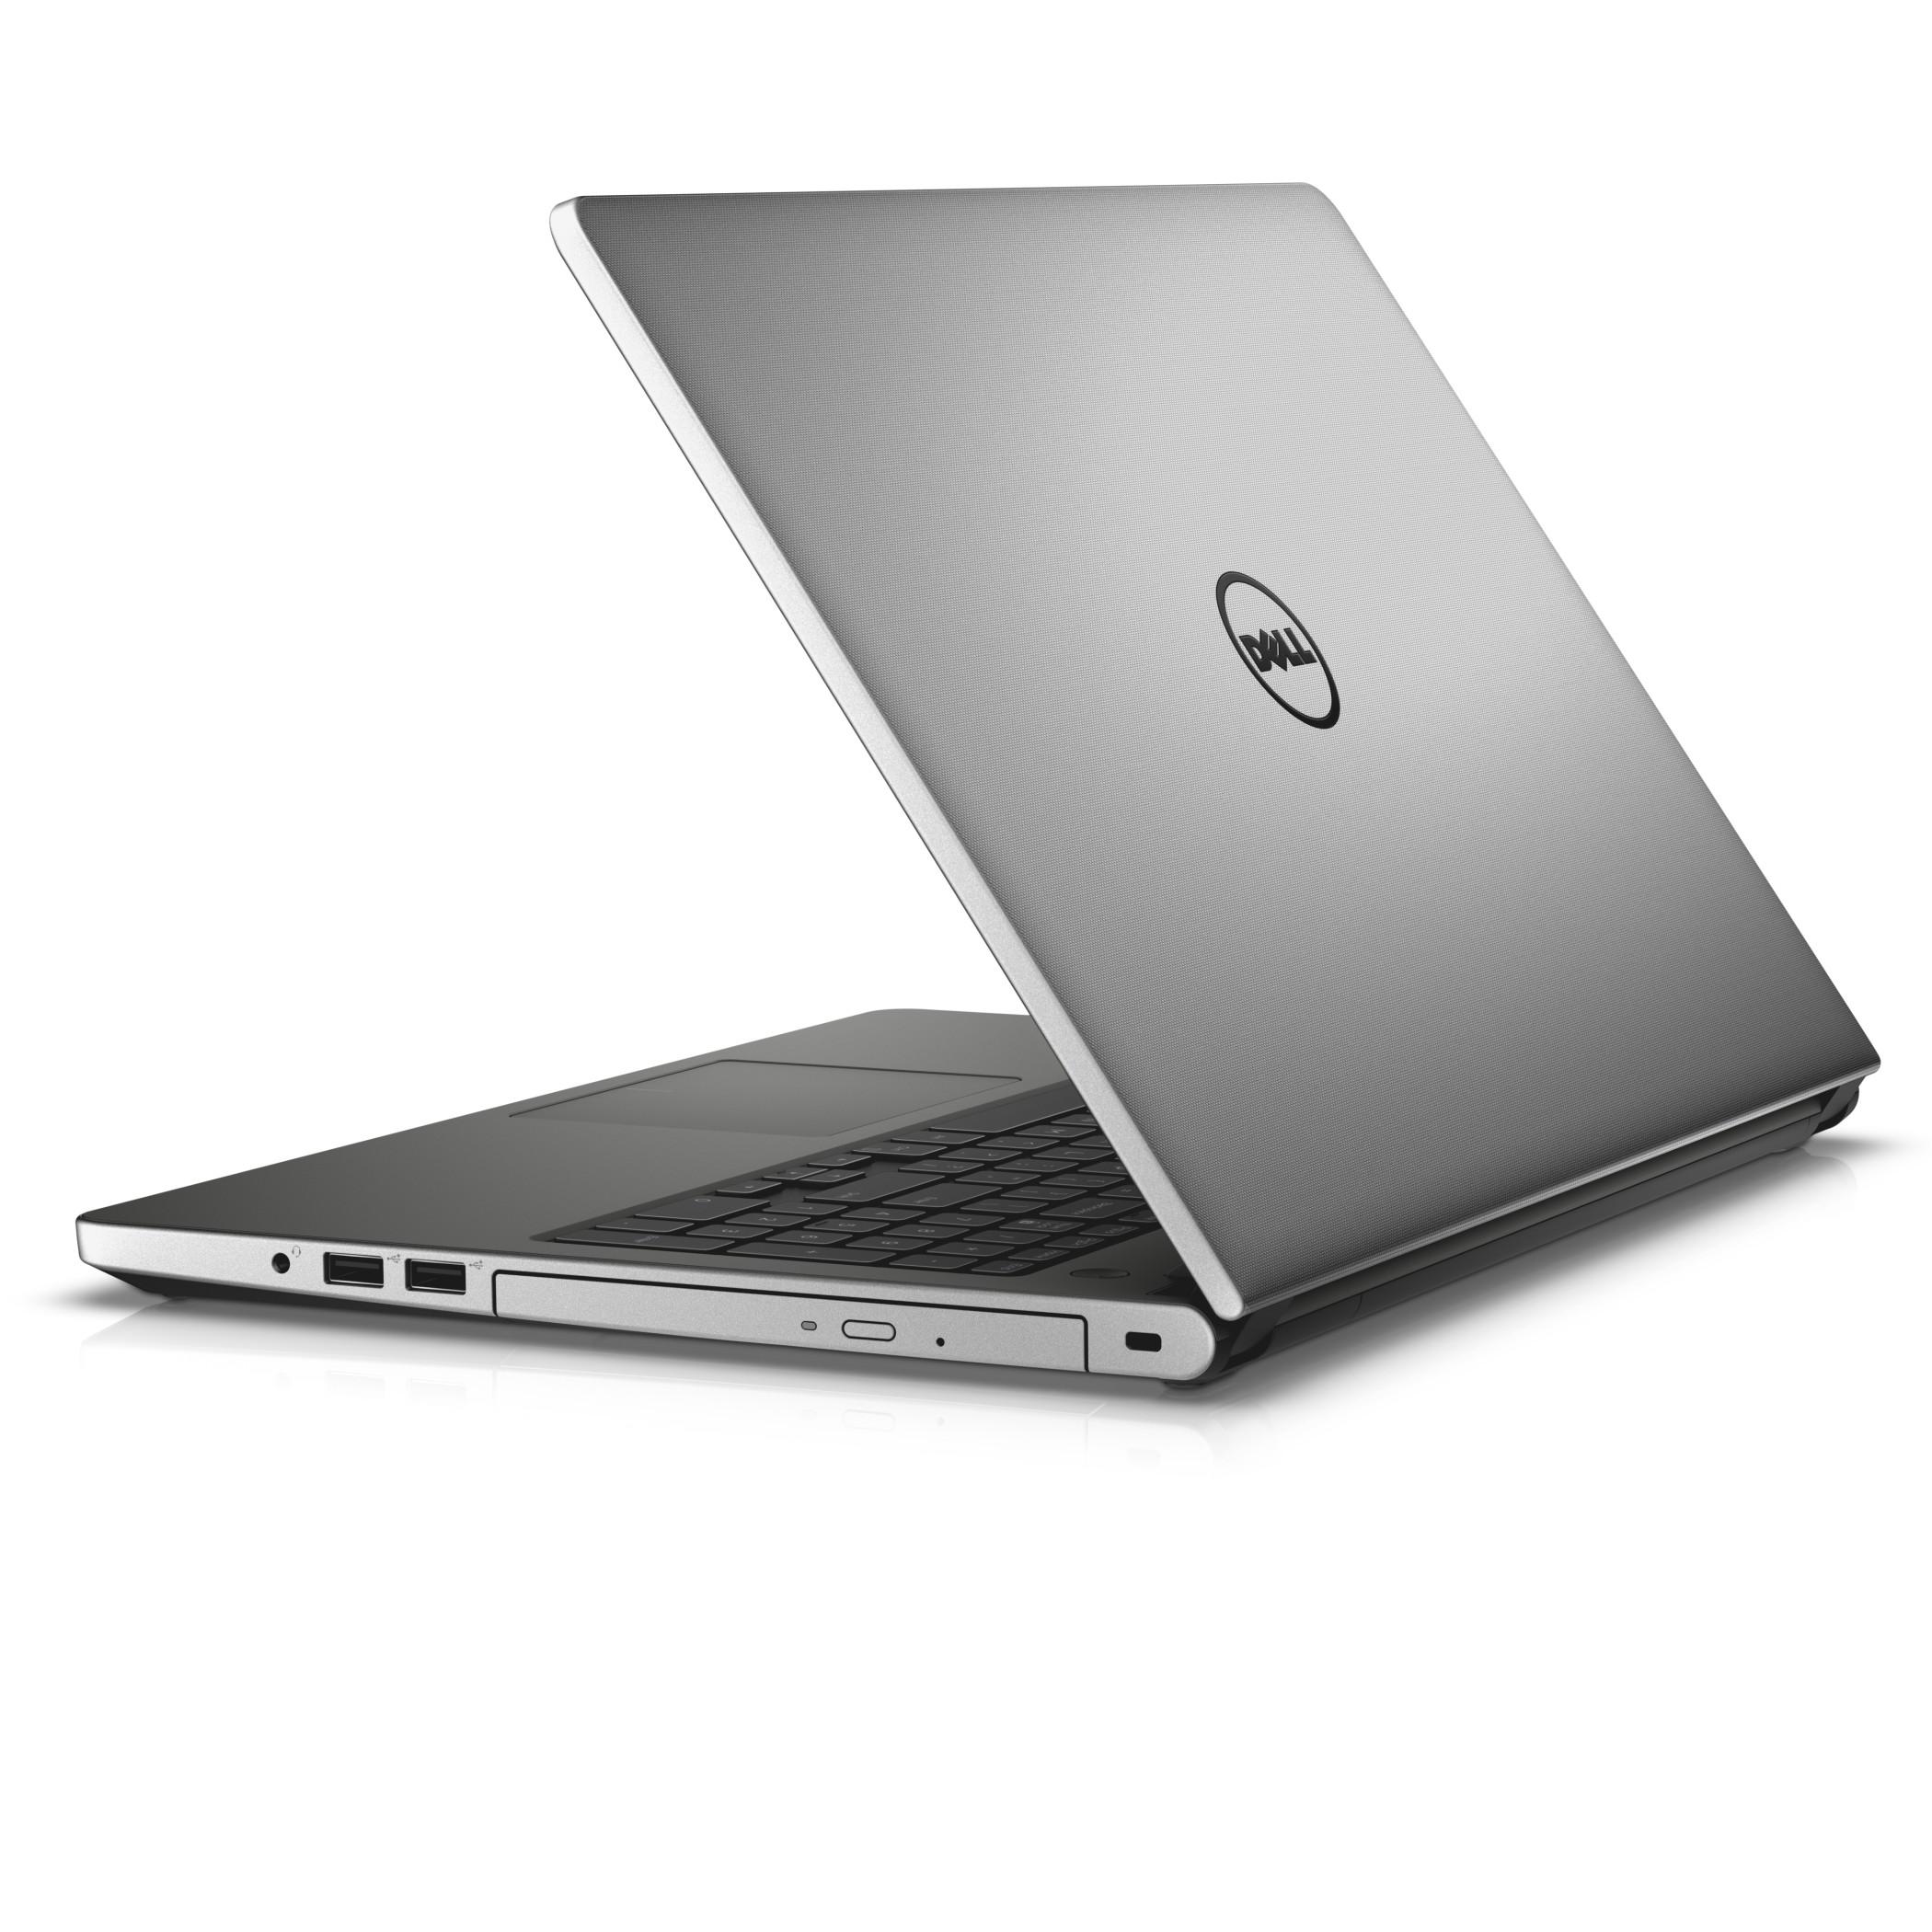 "Dell Inspiron 5559 15"" FHD/i5-6200U/8GB/1TB HDD/M335/WIFI/BT/W10 Home(64-bit)/2RNB/Stříbrný"